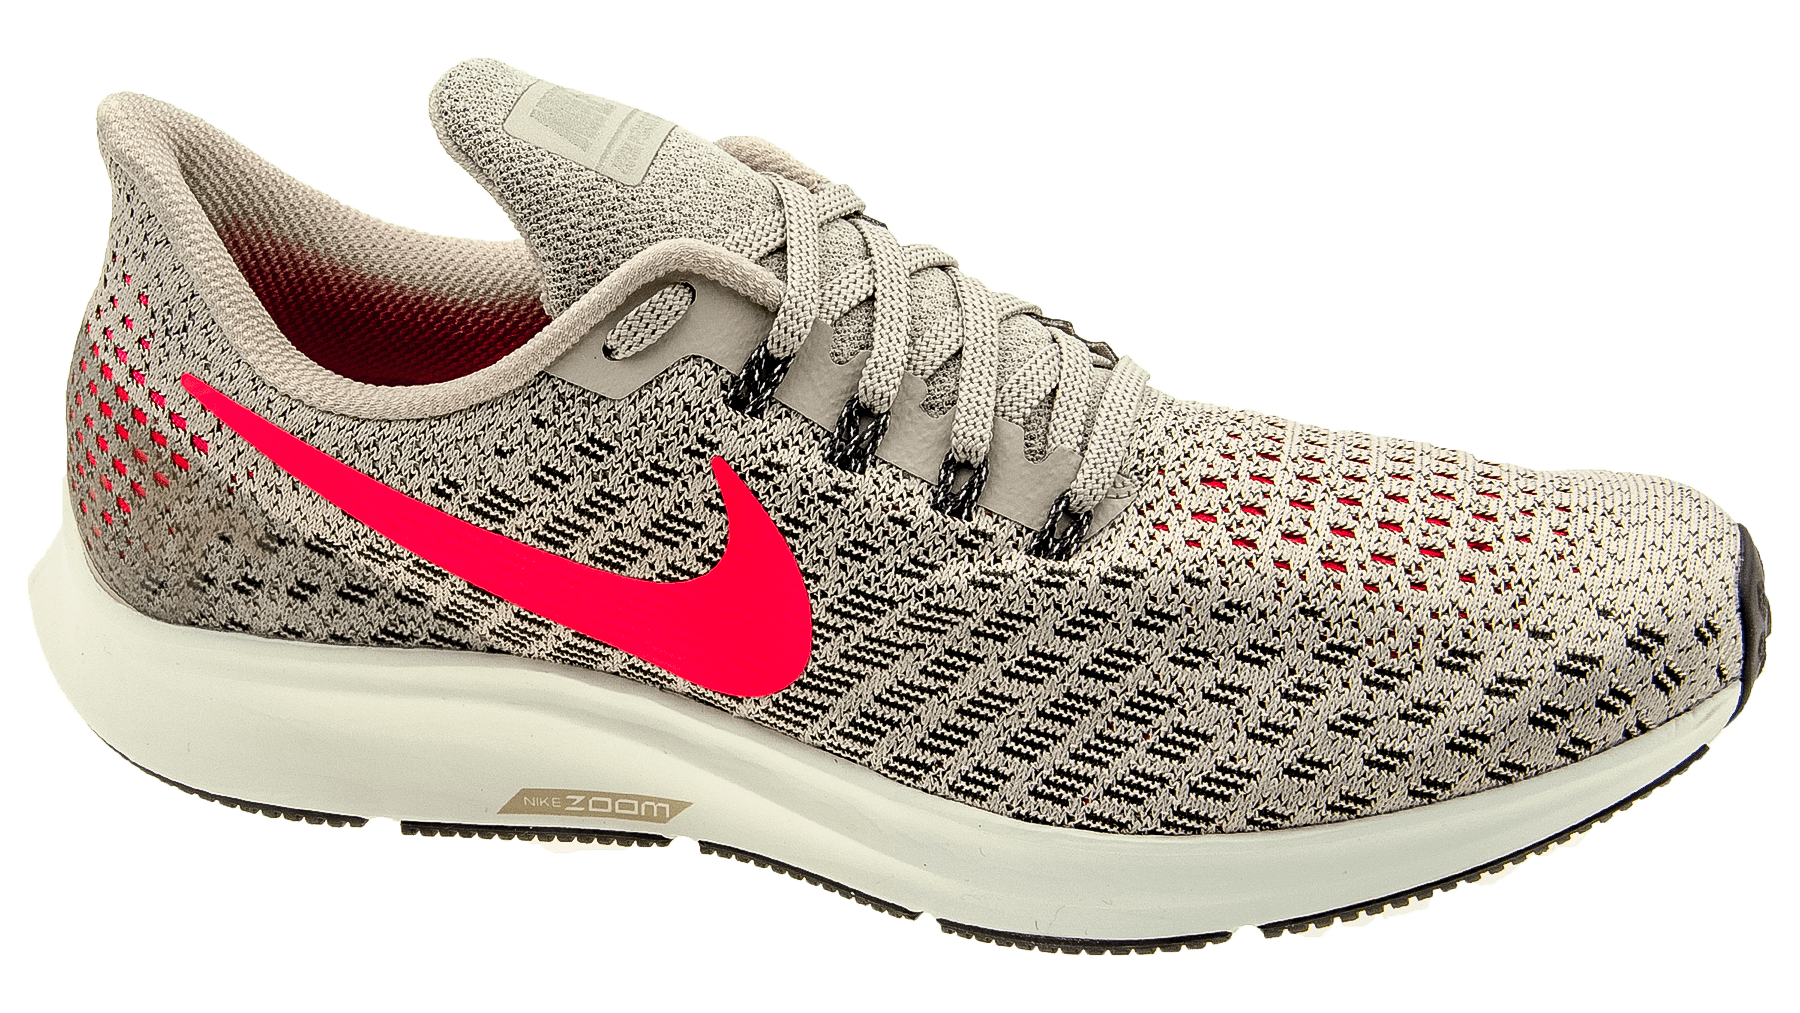 new product 68da4 ed55c Nike Air Zoom Pegasus 35 particle roseflash crimson bestellen bij  Skate-dump.nl